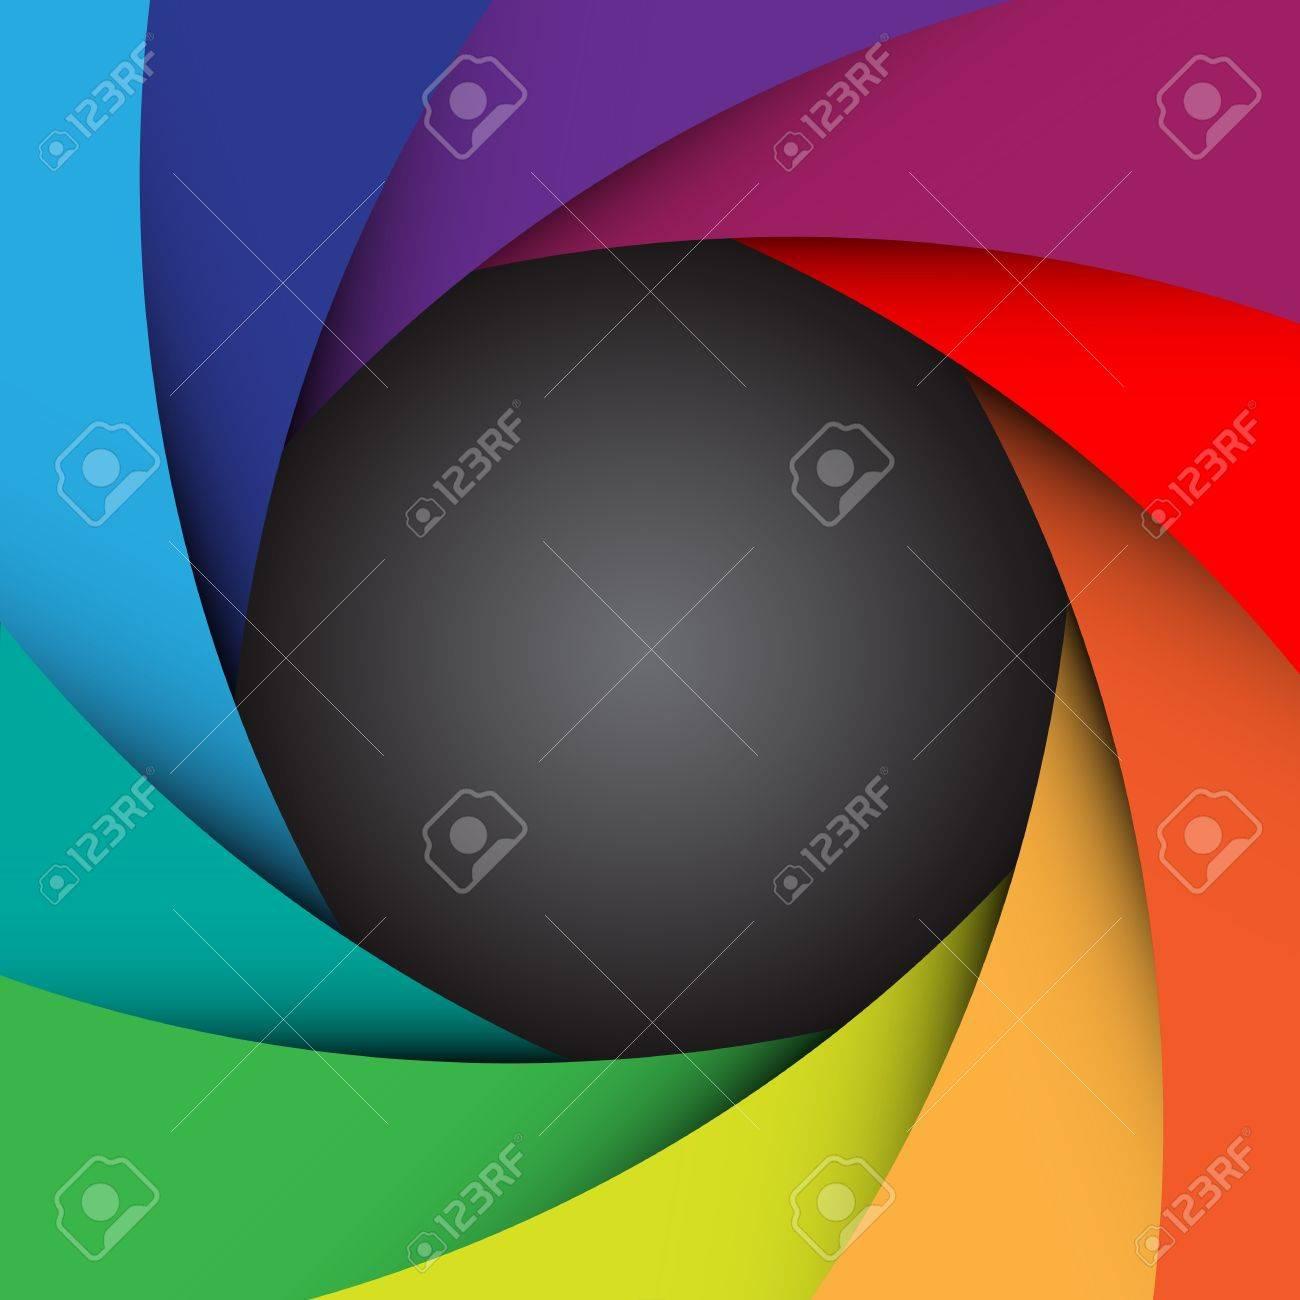 Colorful camera shutter background illustration Stock Vector - 17422019